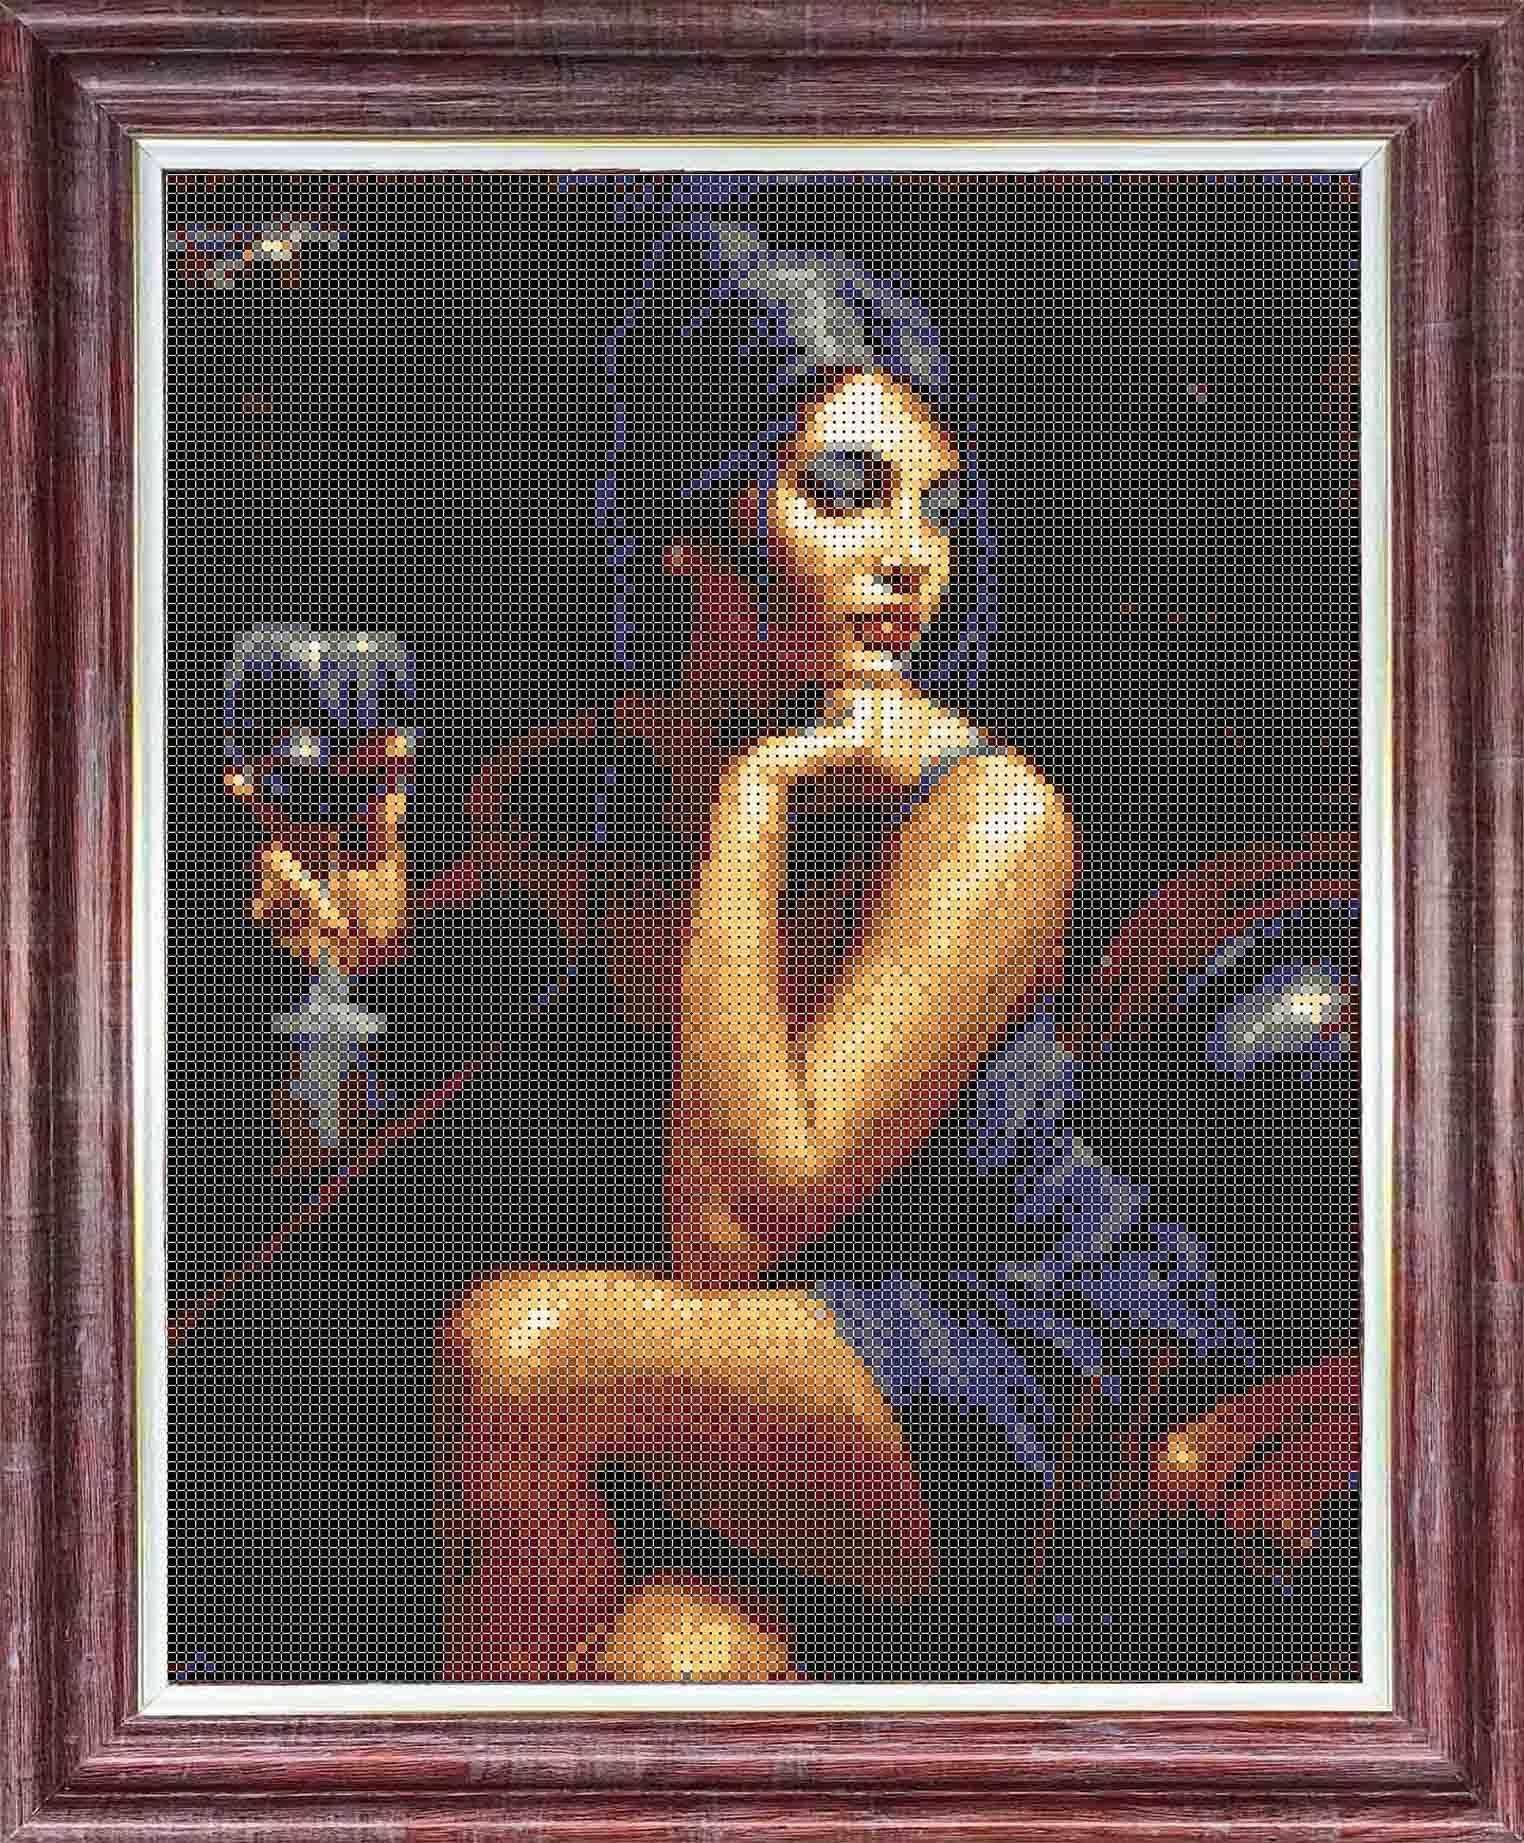 КТКН 146 Девушка с бокалом -  набор (Каролинка)